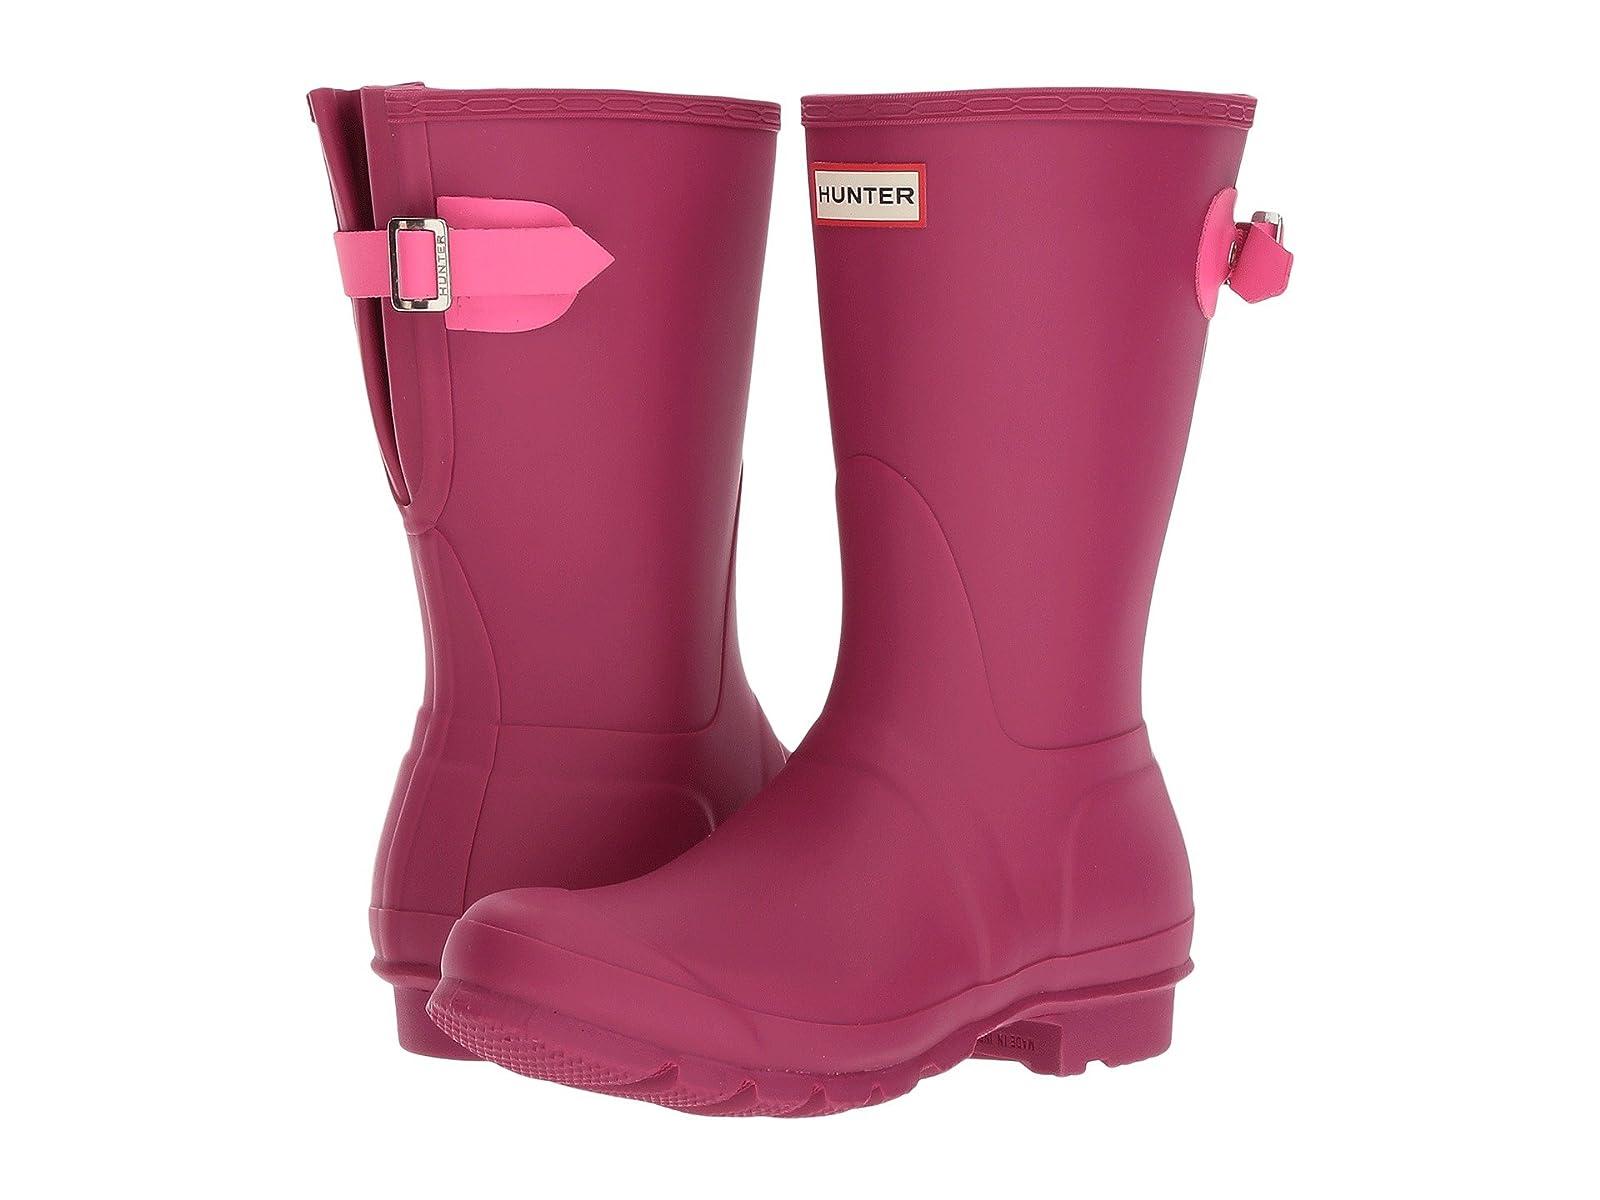 Hunter Original Short Back Adjustable Rain BootsCheap and distinctive eye-catching shoes